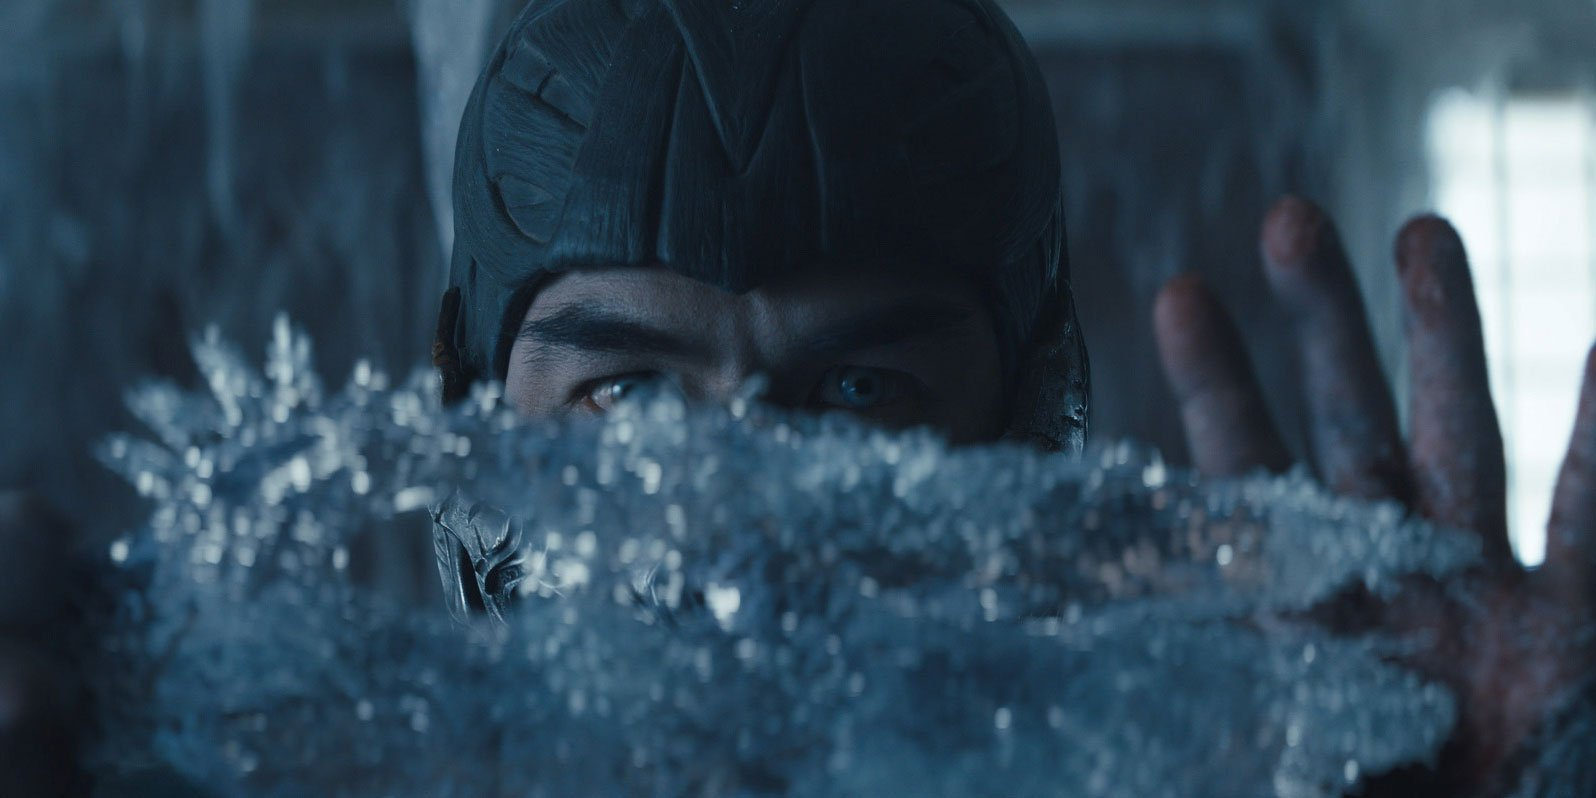 Joe Taslim as Sub-Zero in Mortal Kombat